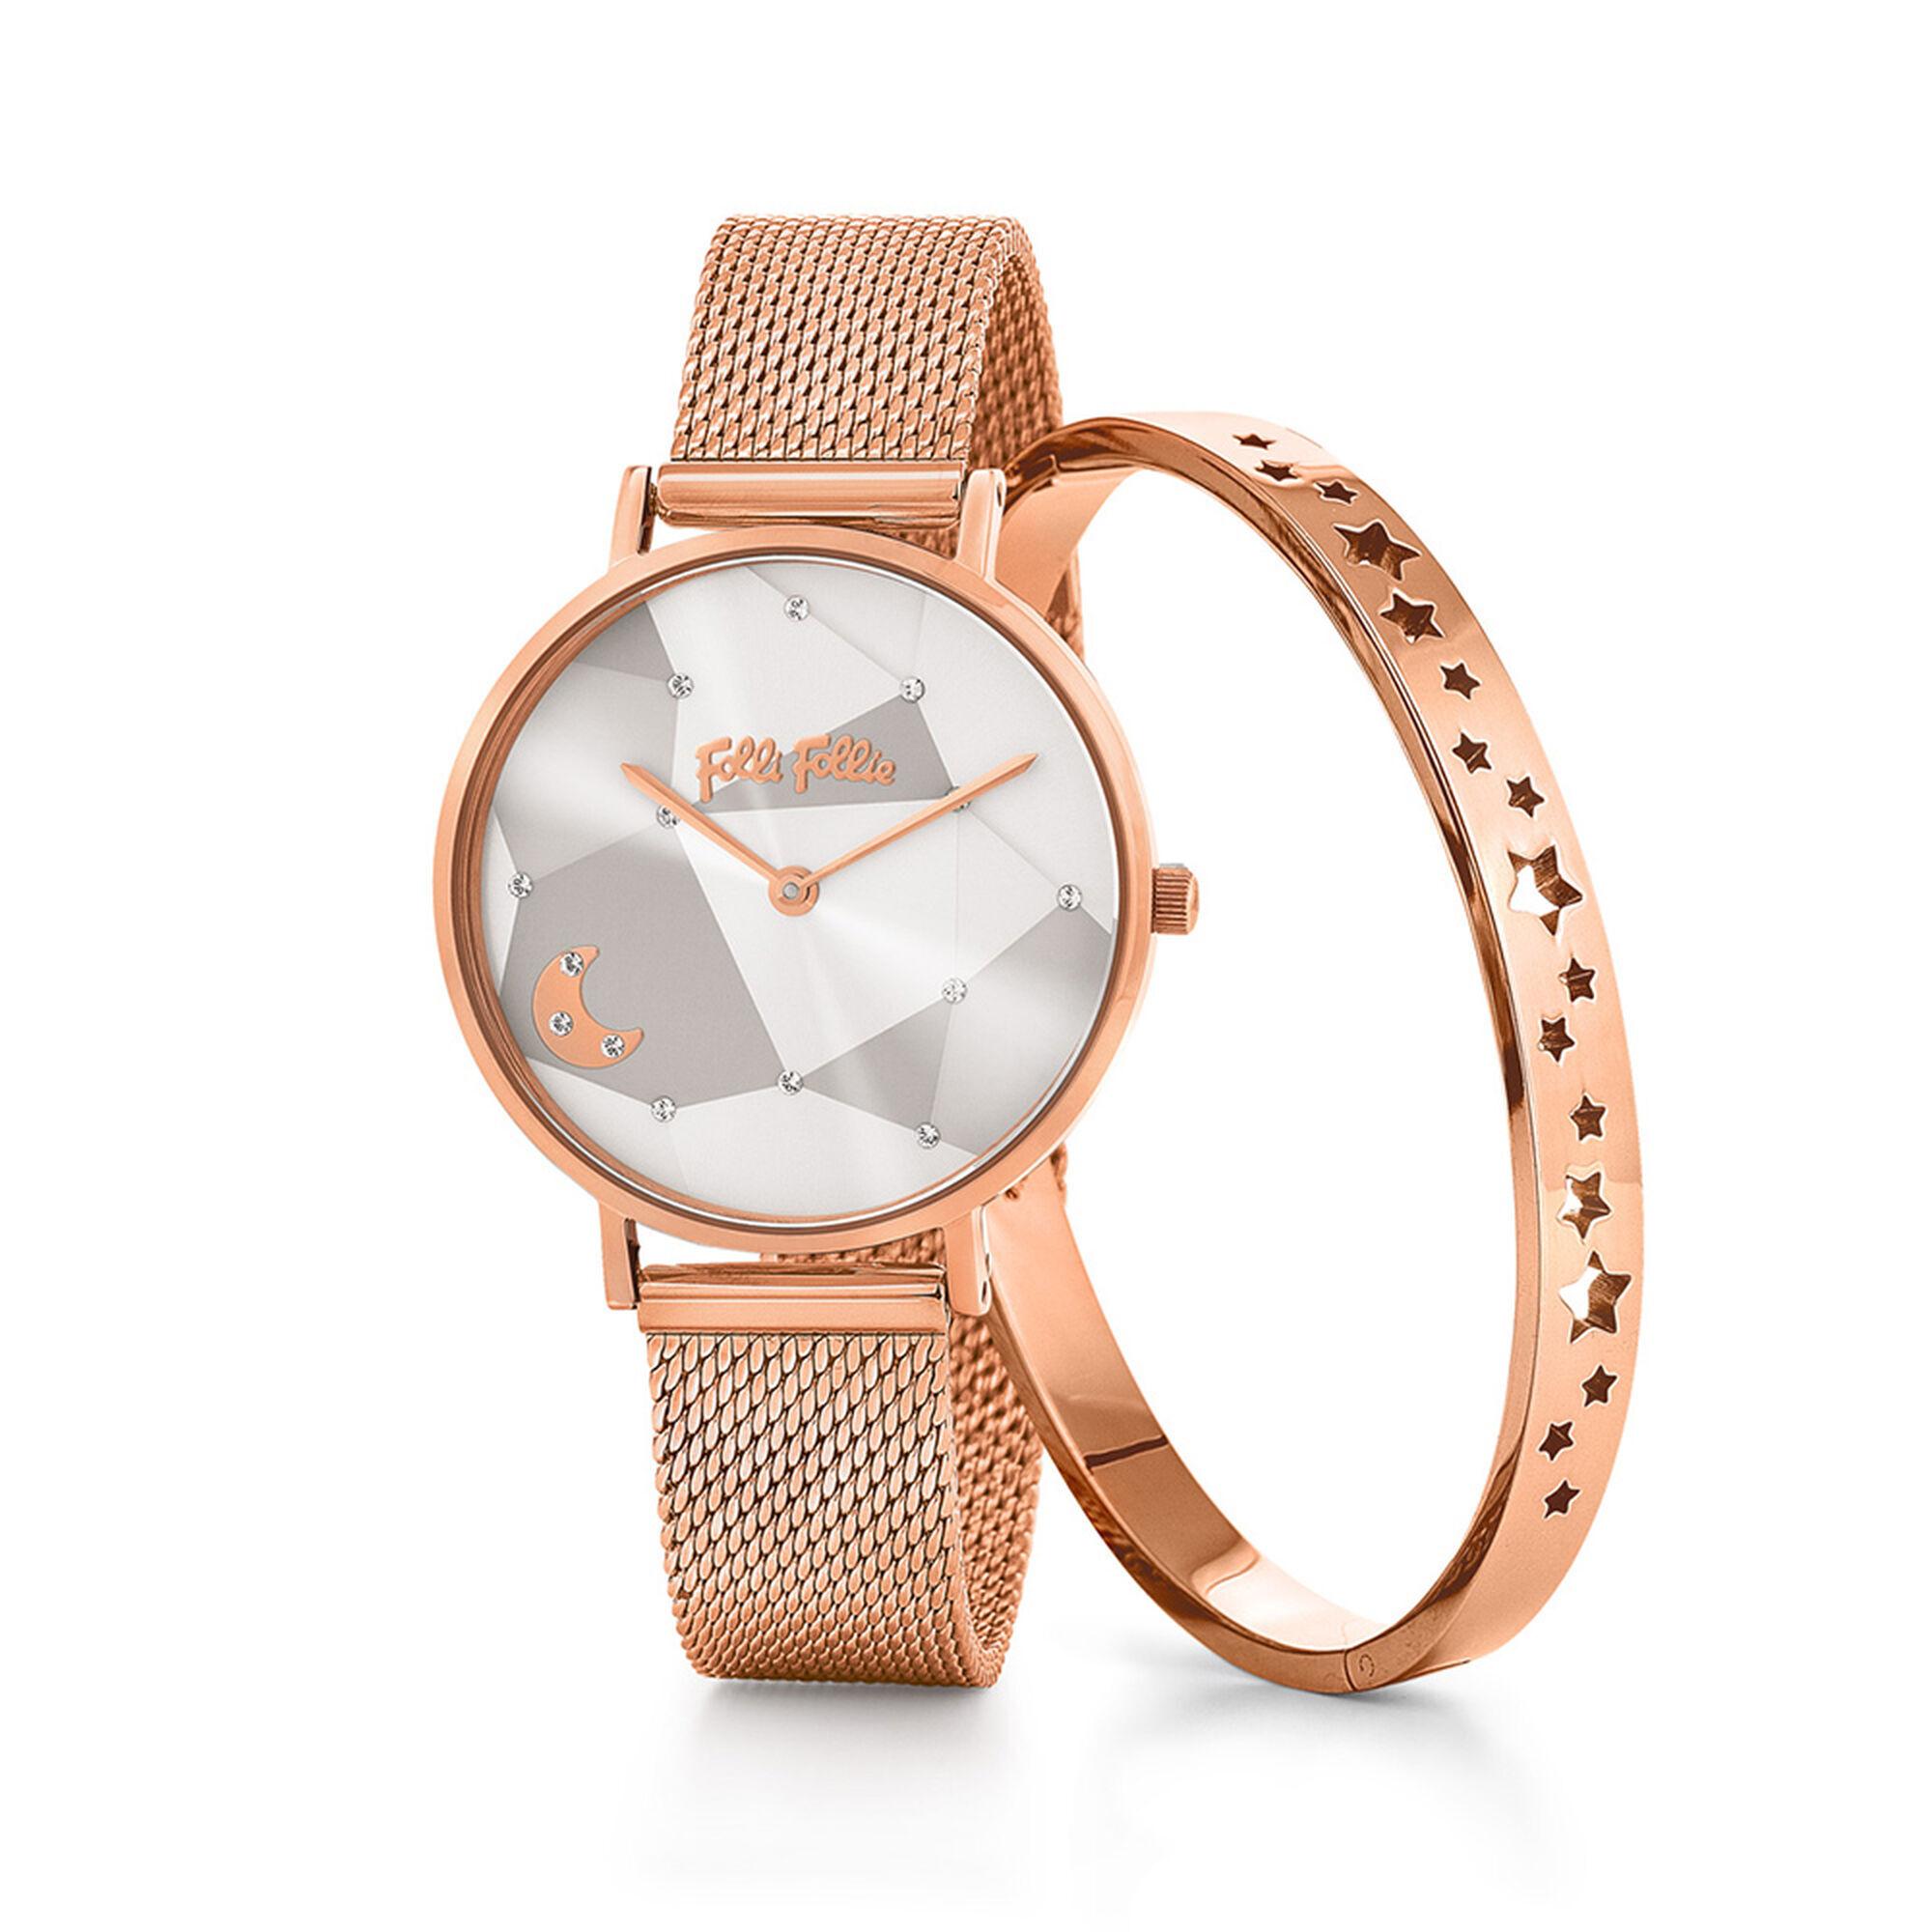 STARGAZE バングル&ウォッチ/腕時計セット